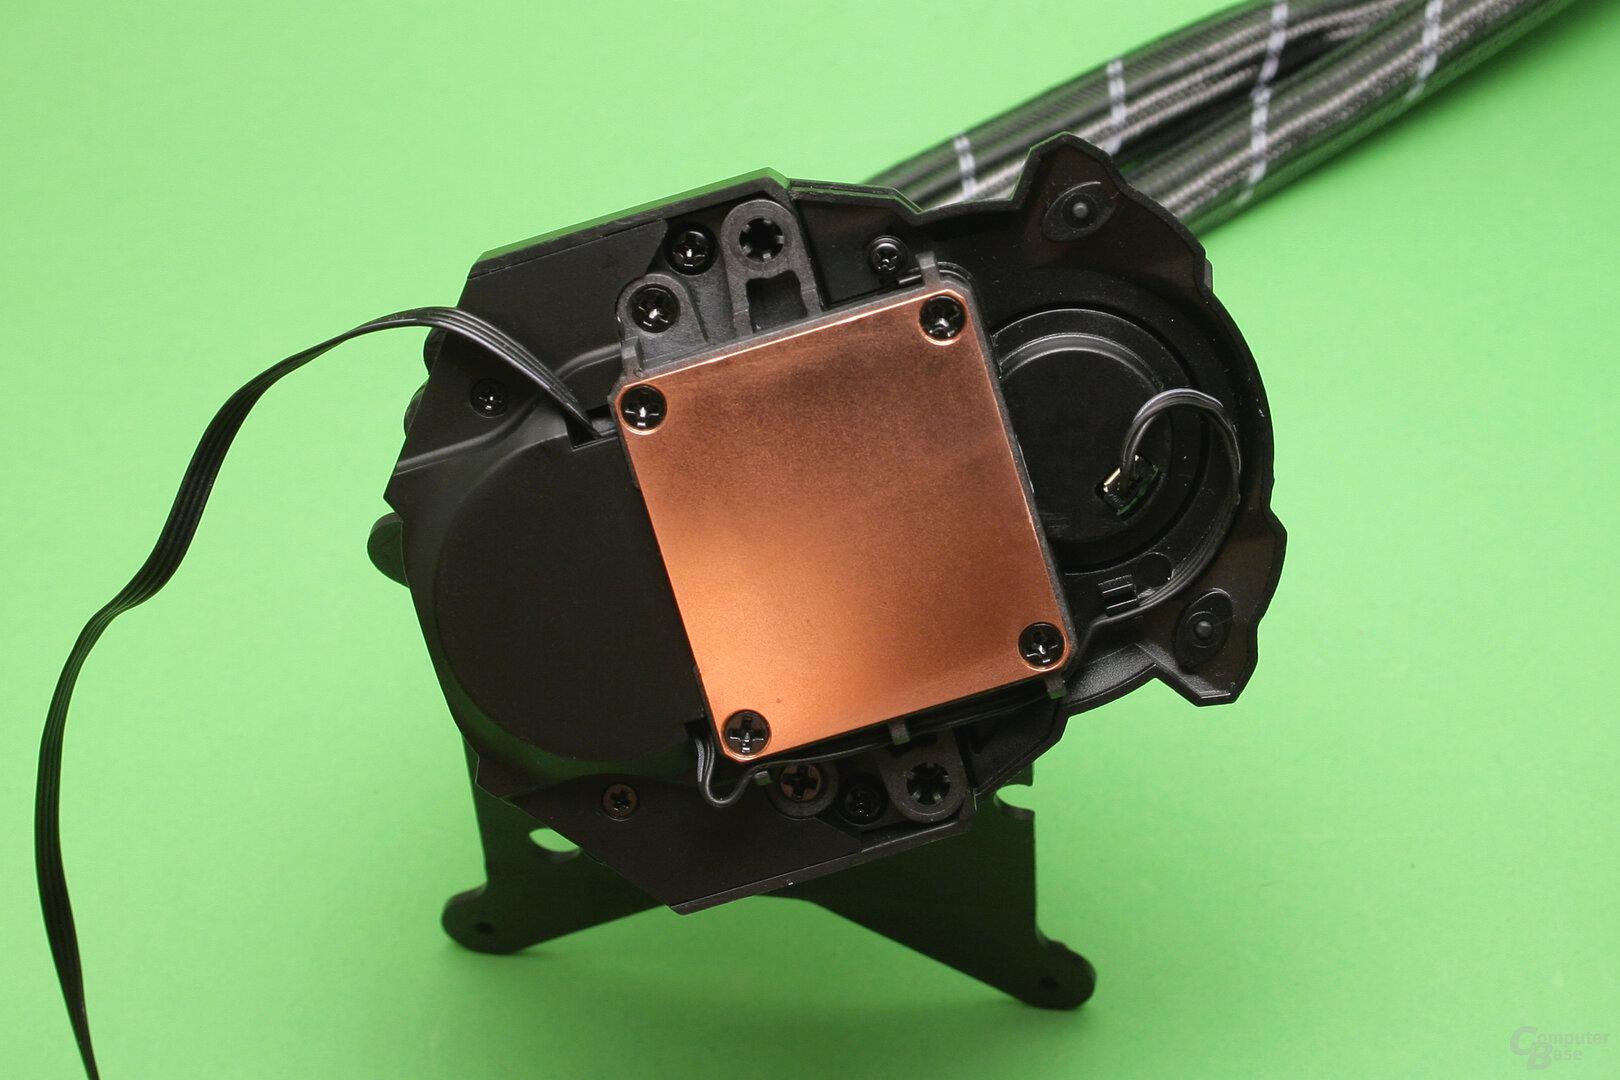 Arctic Liquid Freezer II 240: Die Bodenplatte des CPU-Kühlers